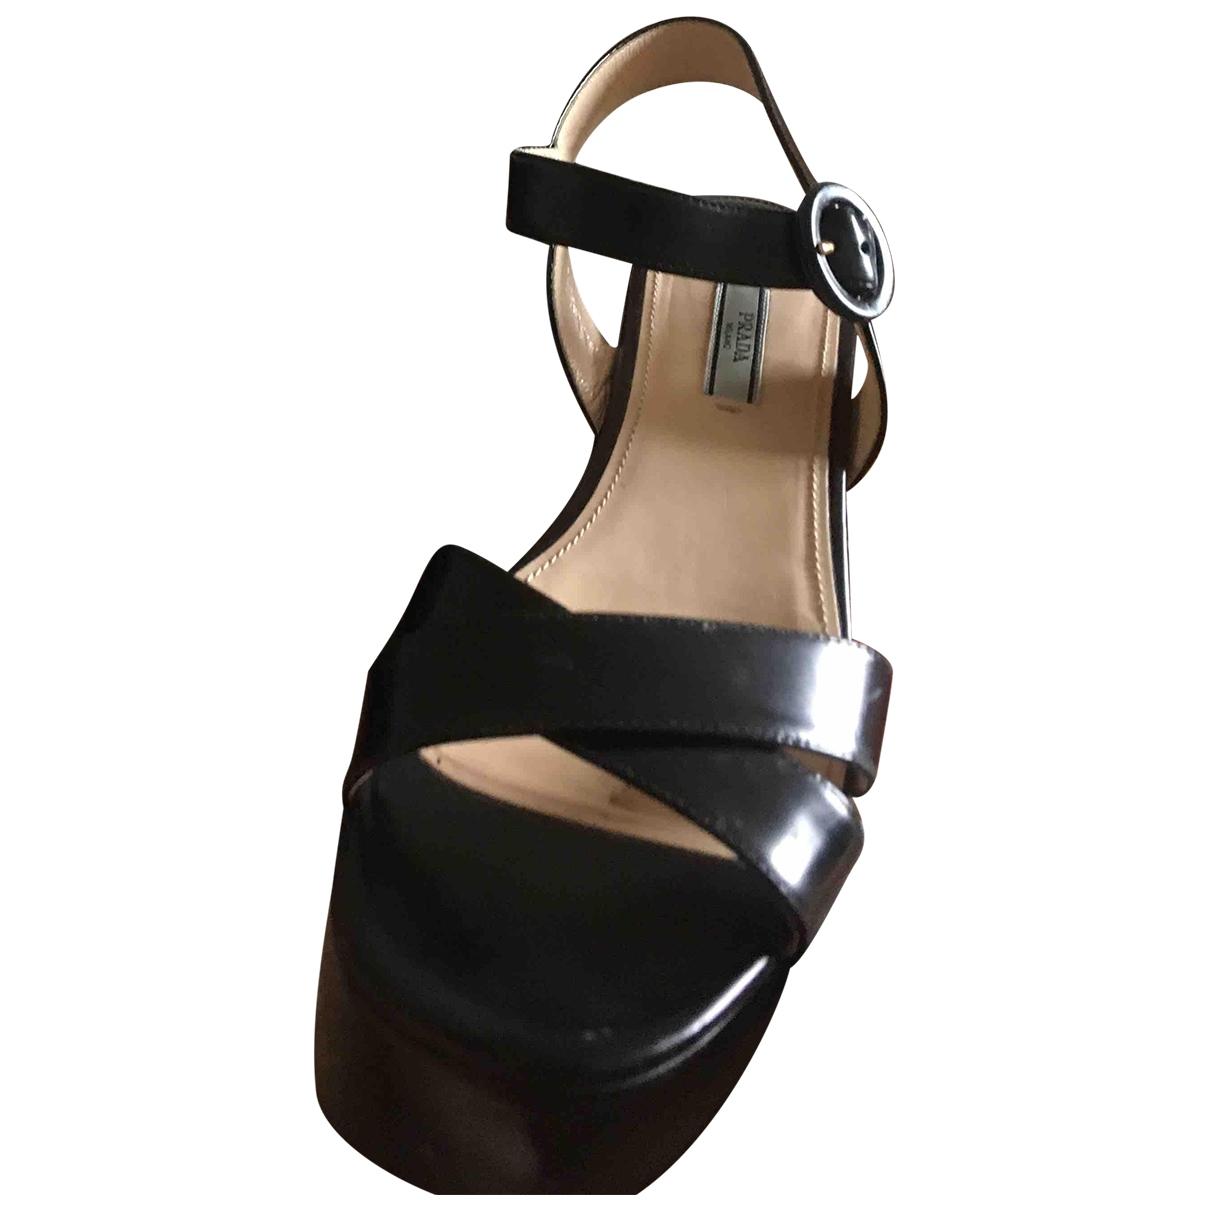 Prada \N Black Patent leather Sandals for Women 40 EU